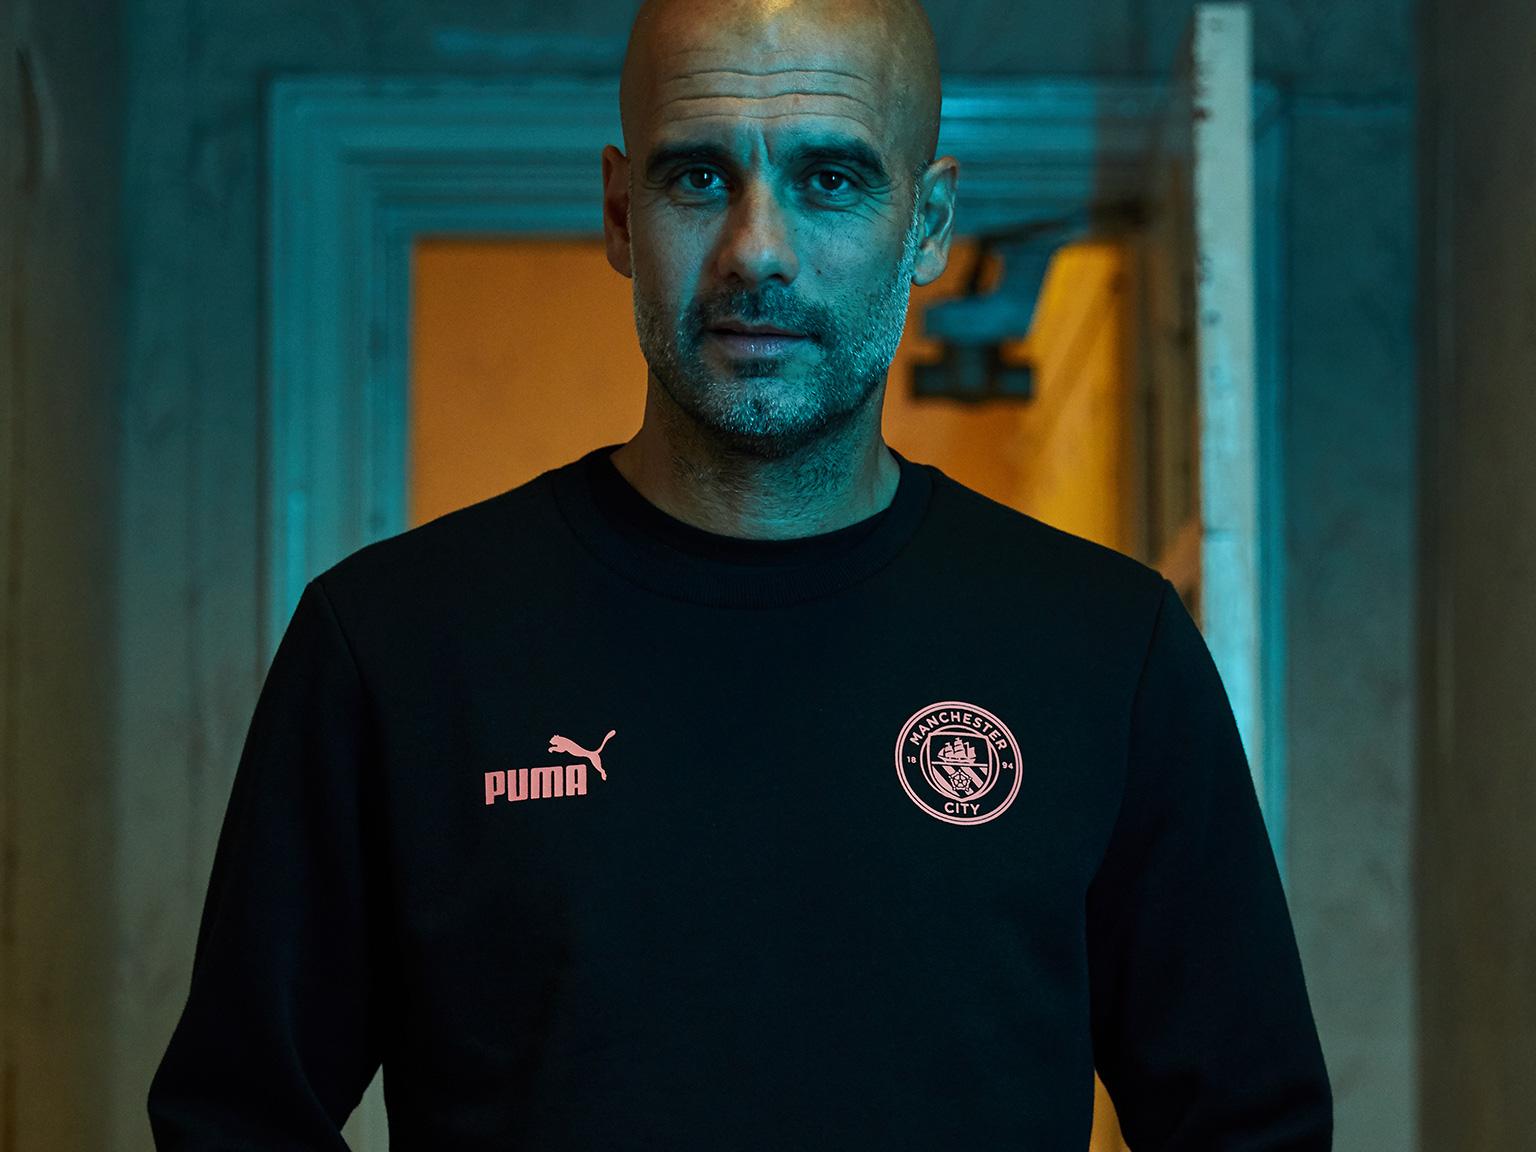 PUMA® - PUMA partners with Manchester City Manager Pep Guardiola